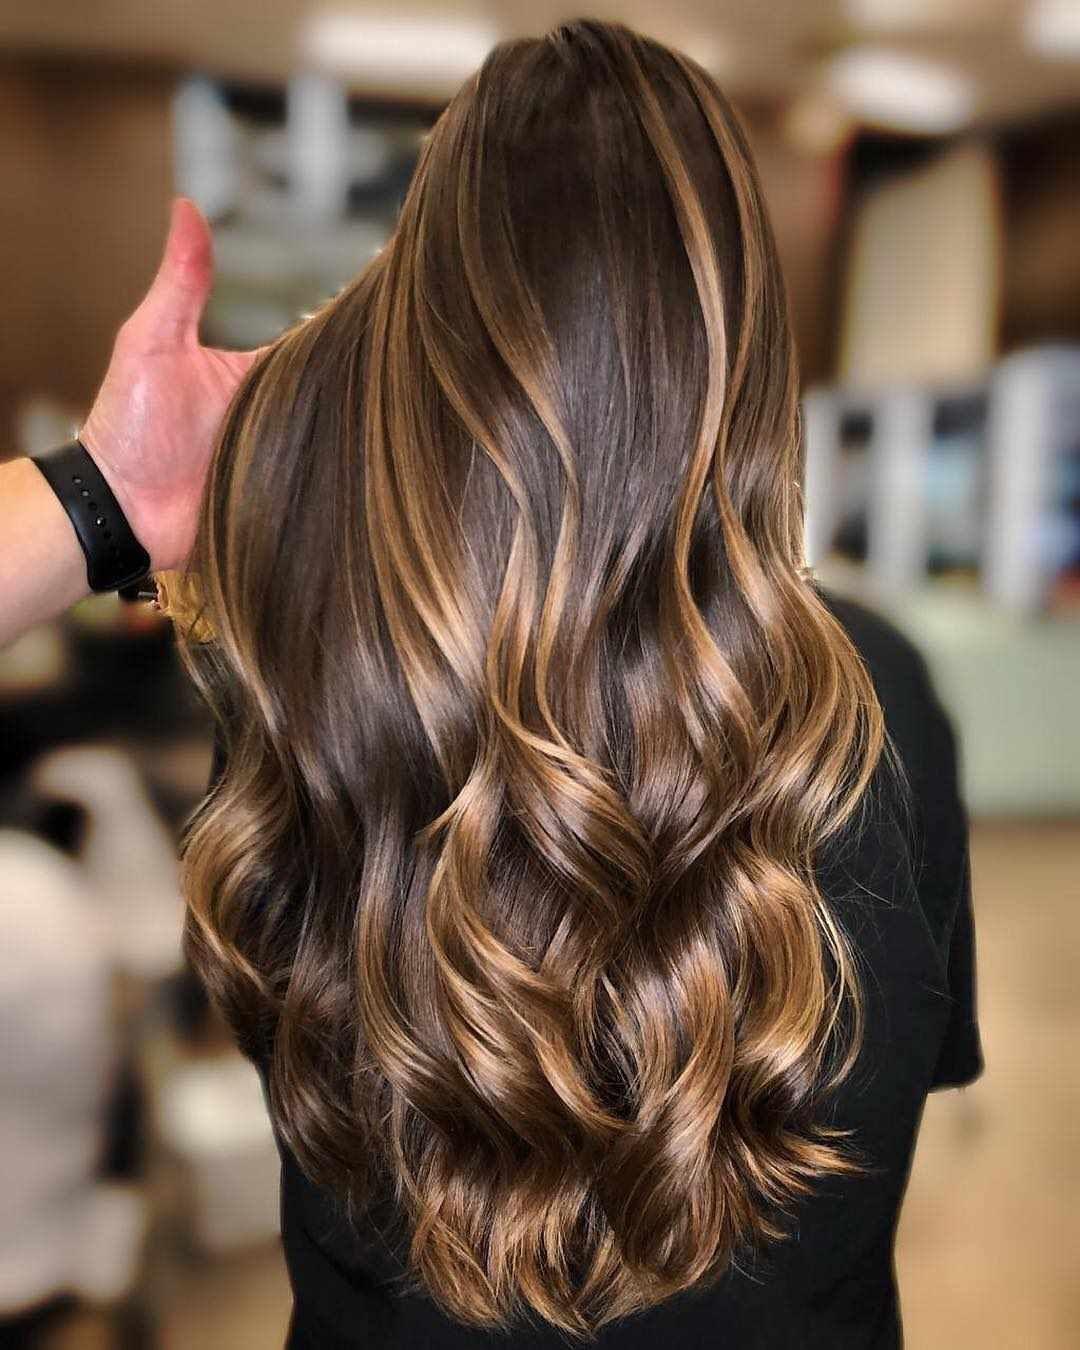 30 Balayage Hair Ideas For Long and Short Hair 2019 – #balayagehair #balayagehaircut #Balayagehairstyle #blondehair #hairstyle #longhair – Hairstyles – Hairstyles 2019